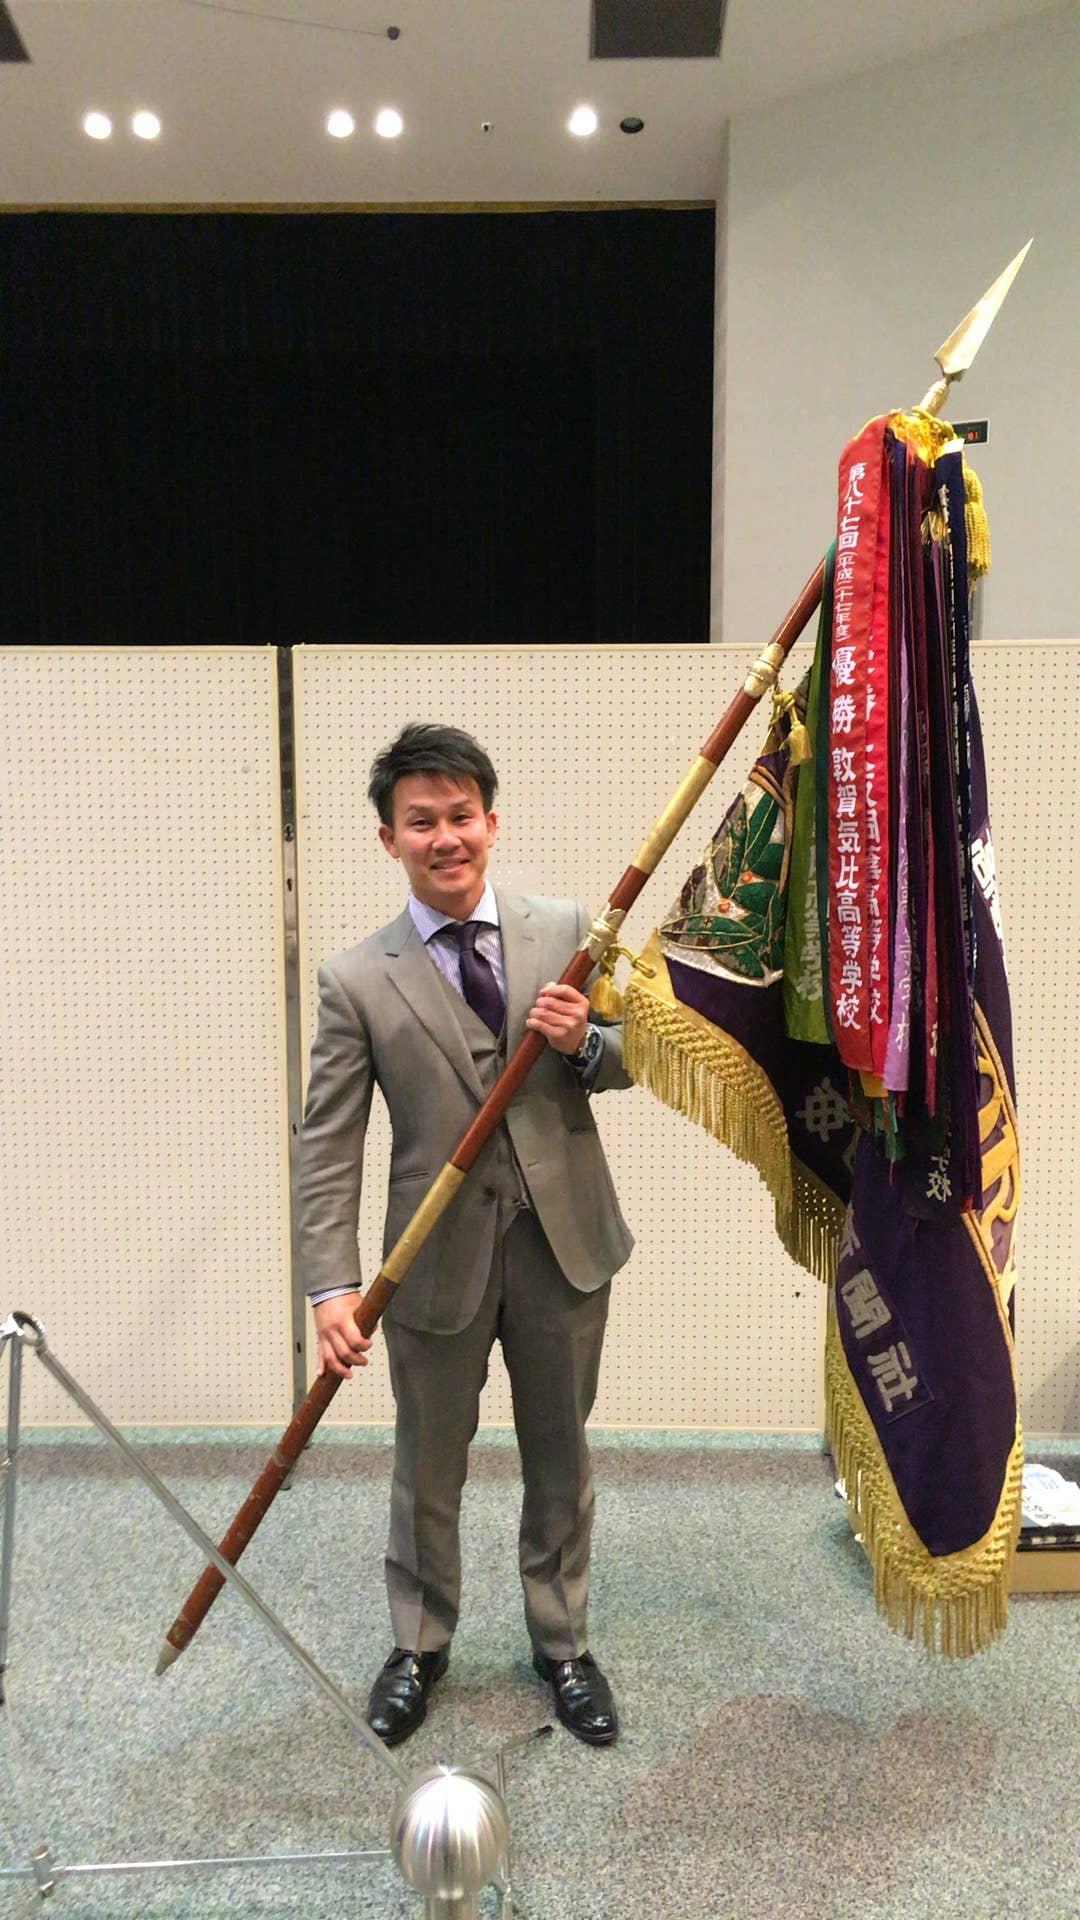 Nobuhiro Funamoto